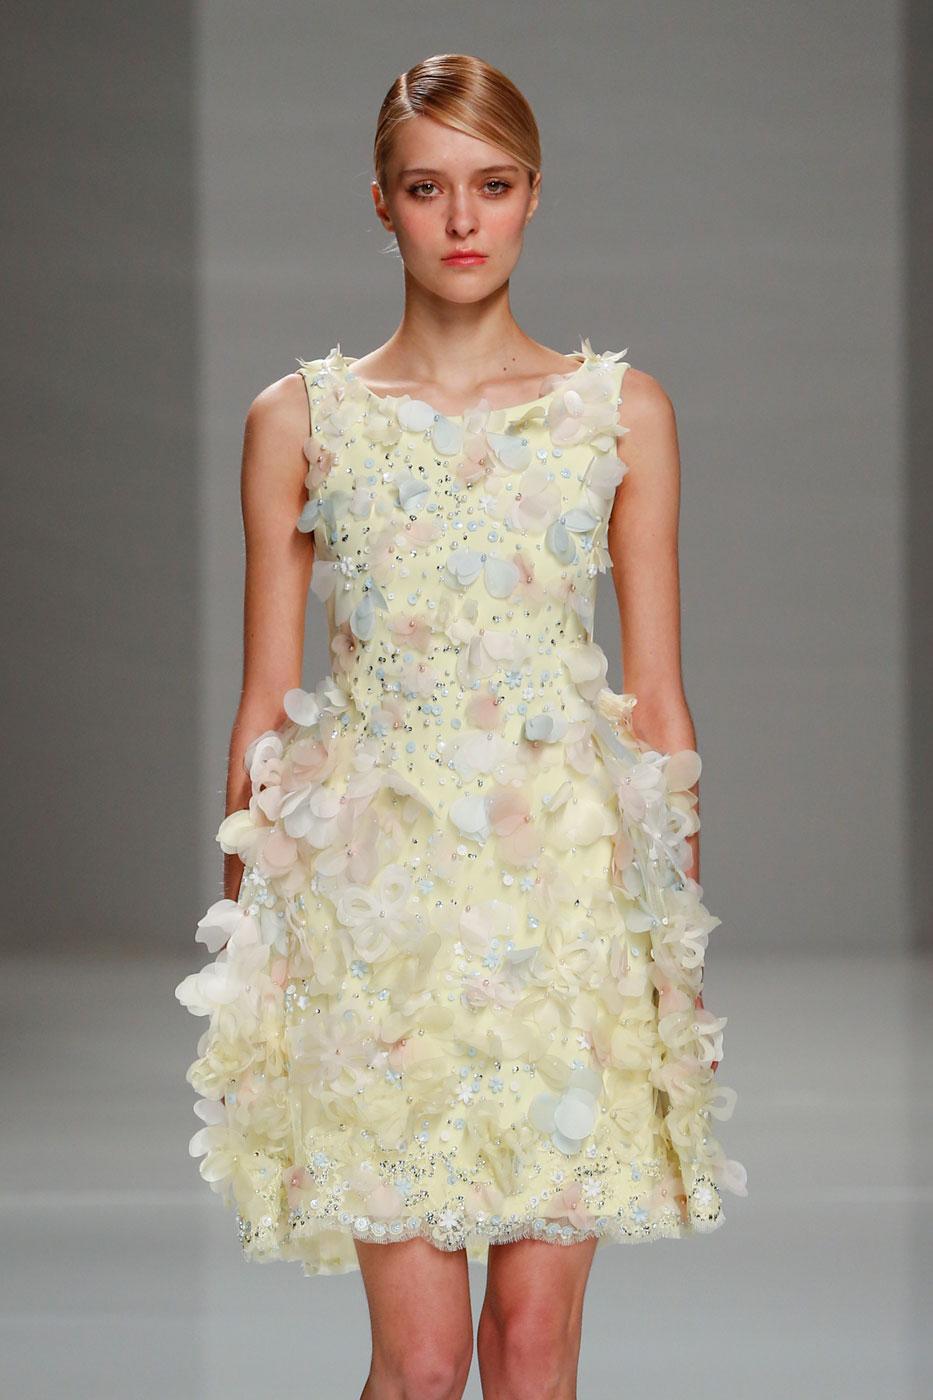 Georges-Hobeika-fashion-runway-show-haute-couture-paris-spring-2015-the-impression-80